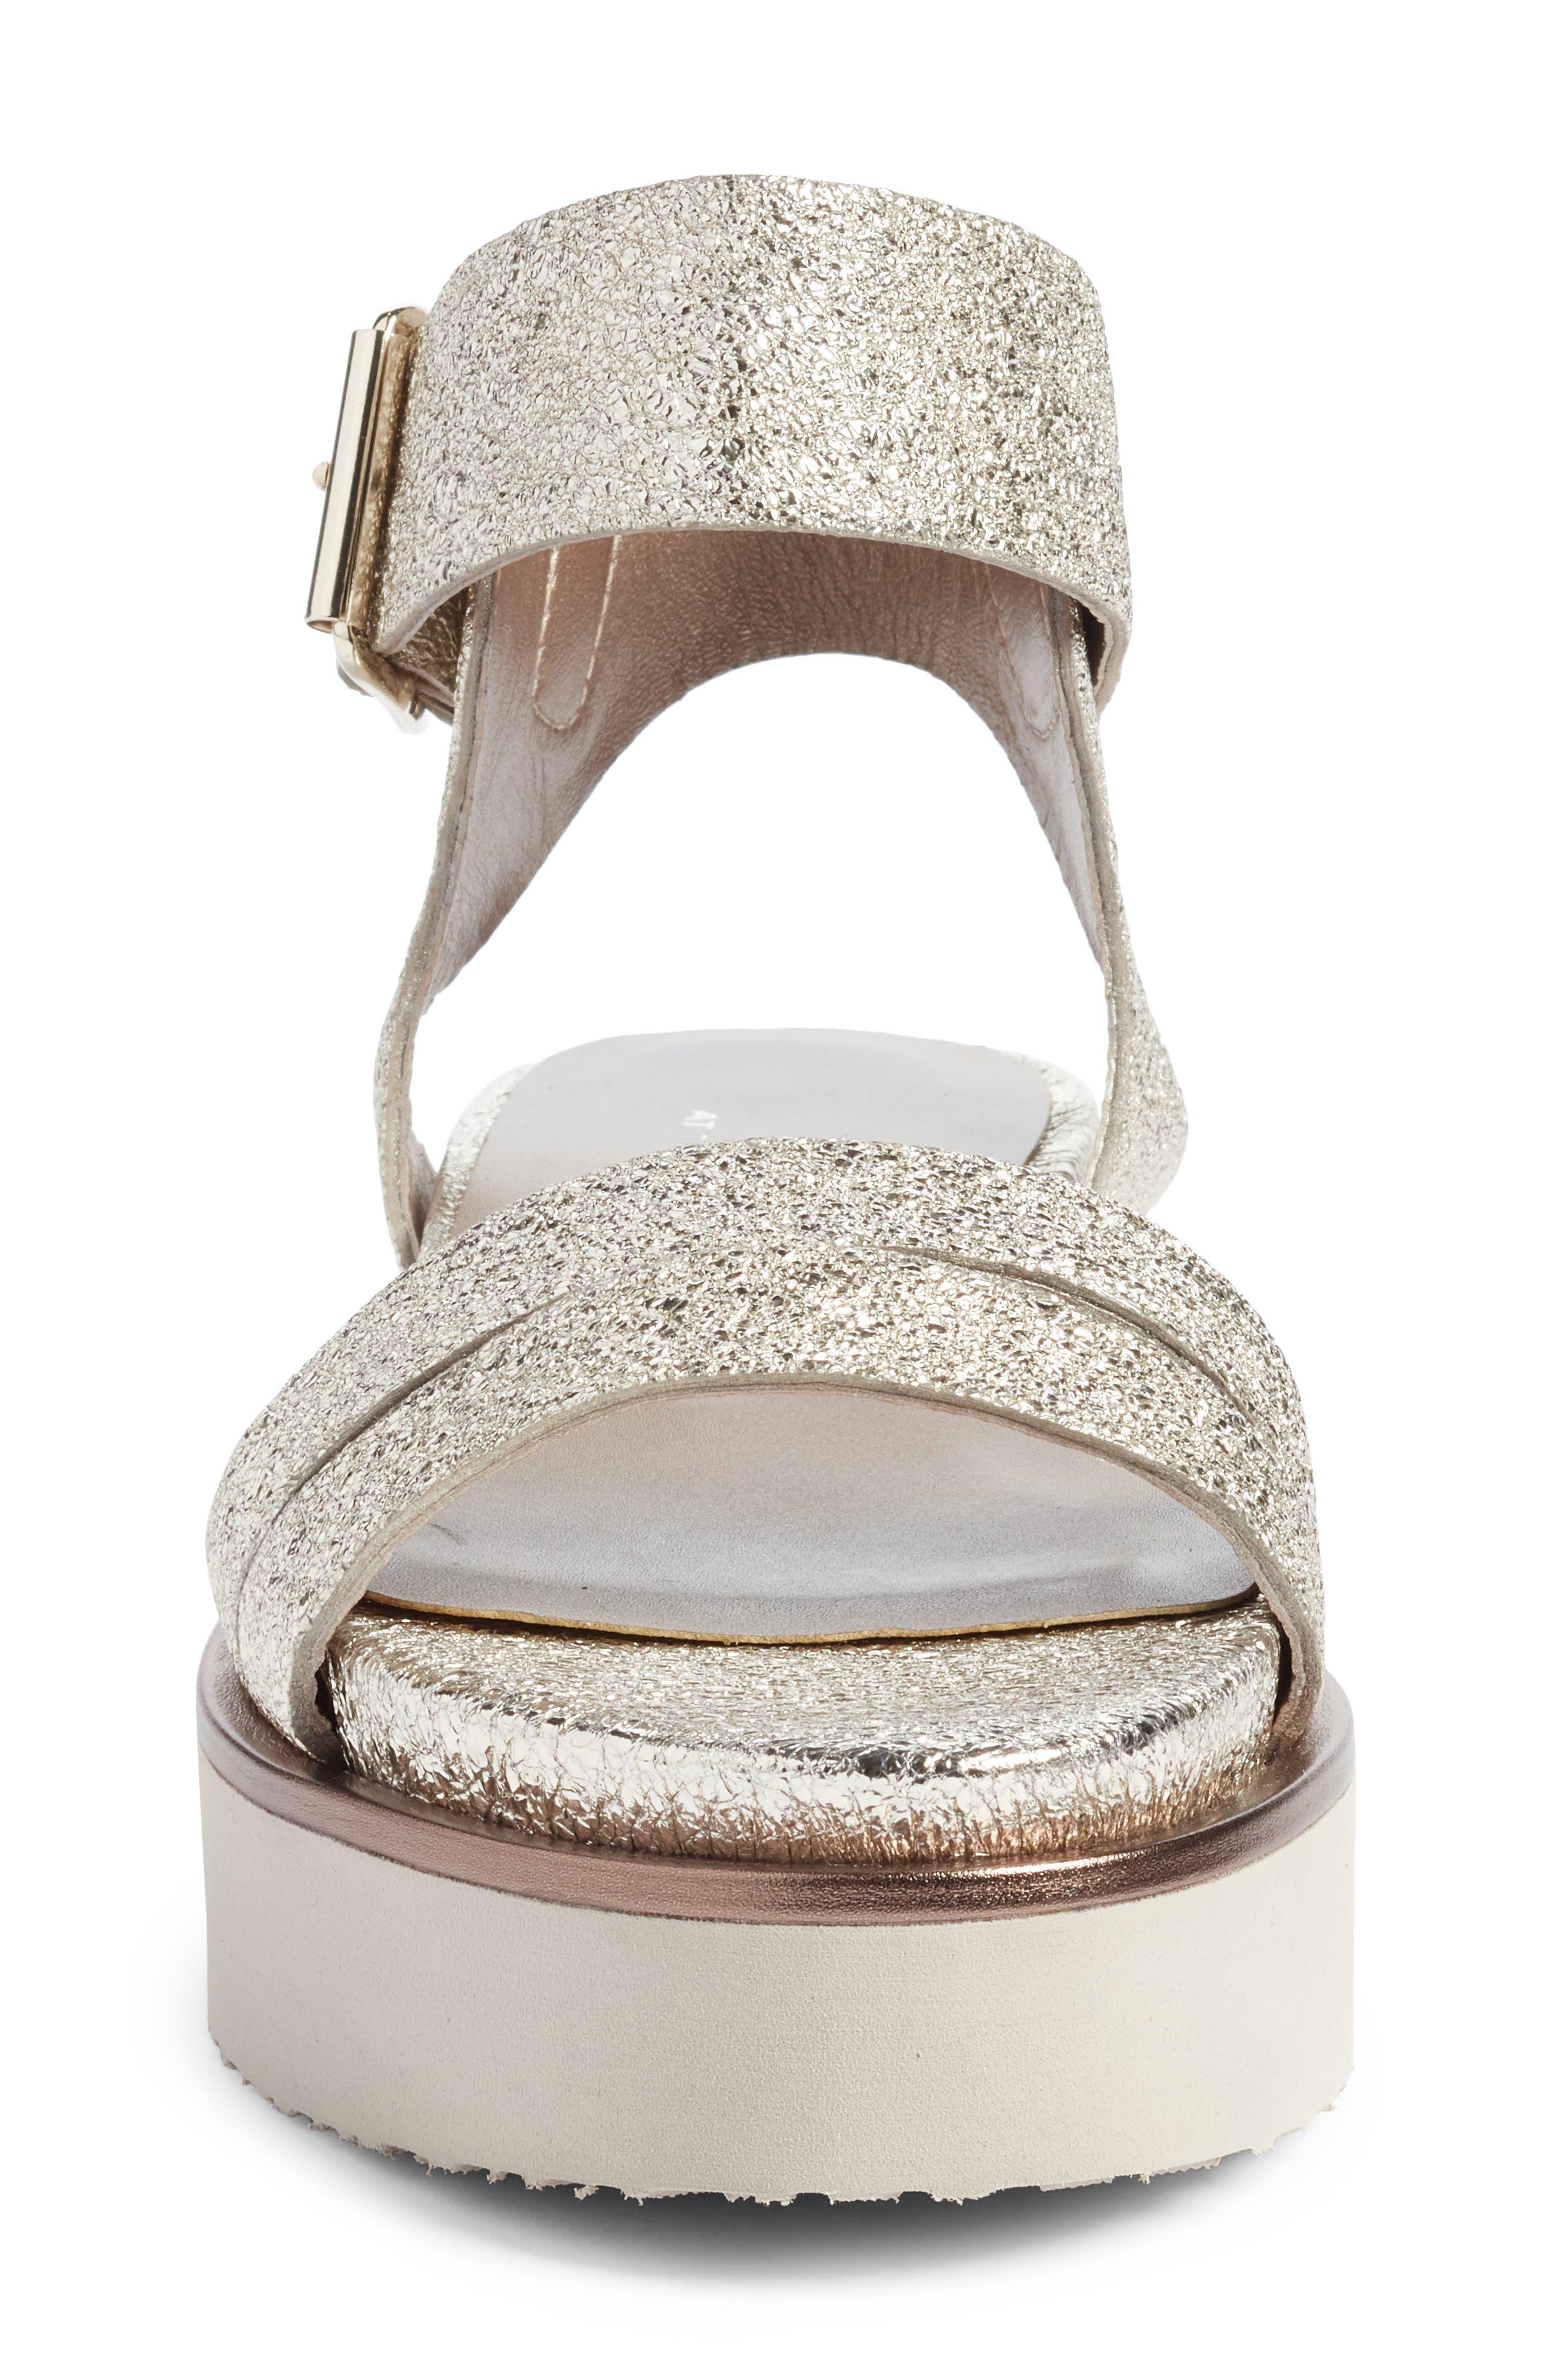 Ankle Strap Sandal,                             Alternate thumbnail 4, color,                             Golden Leather